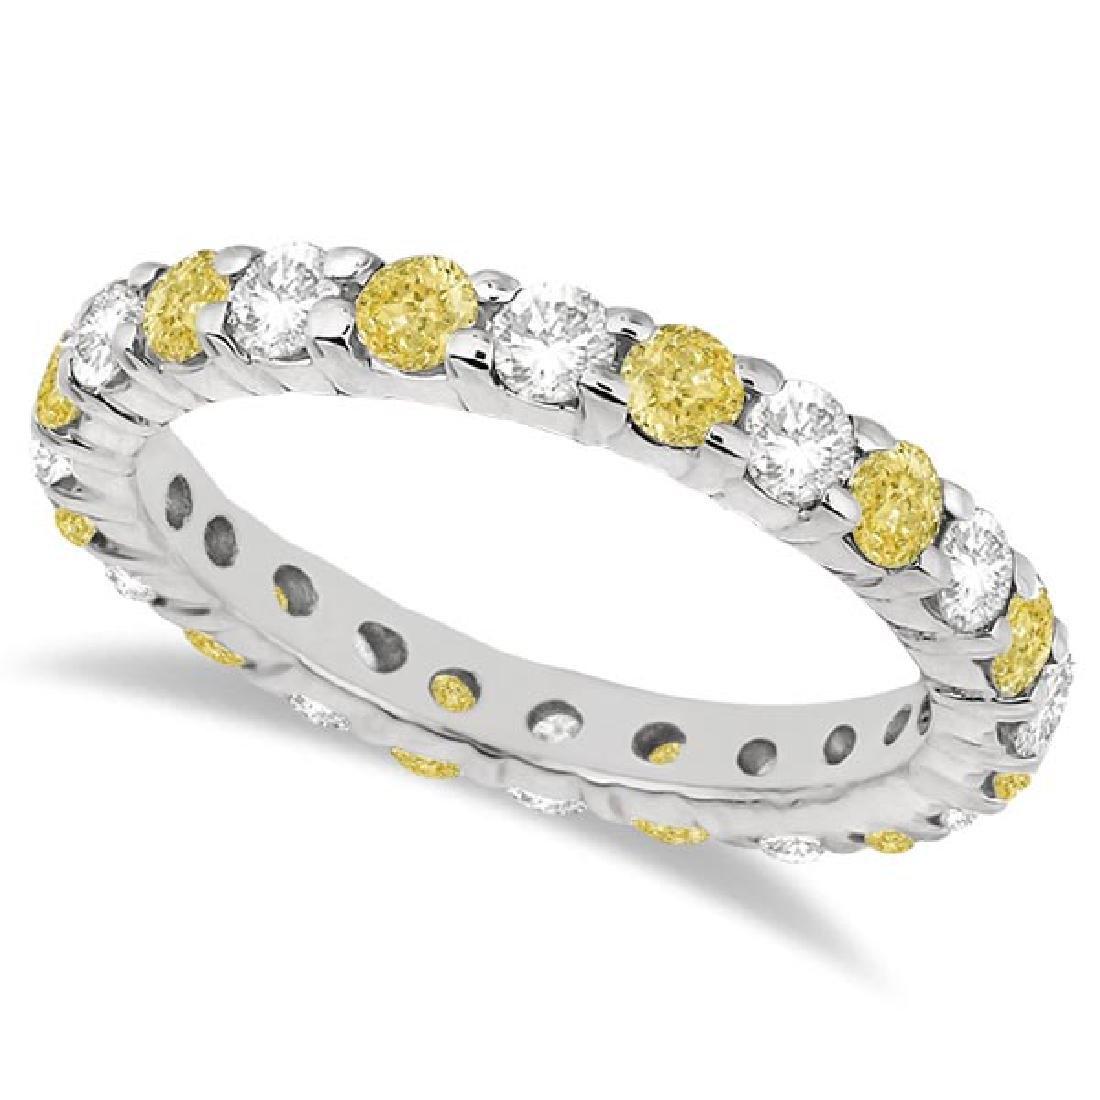 Canary Yellow and White Diamond Eternity Ring 14k White